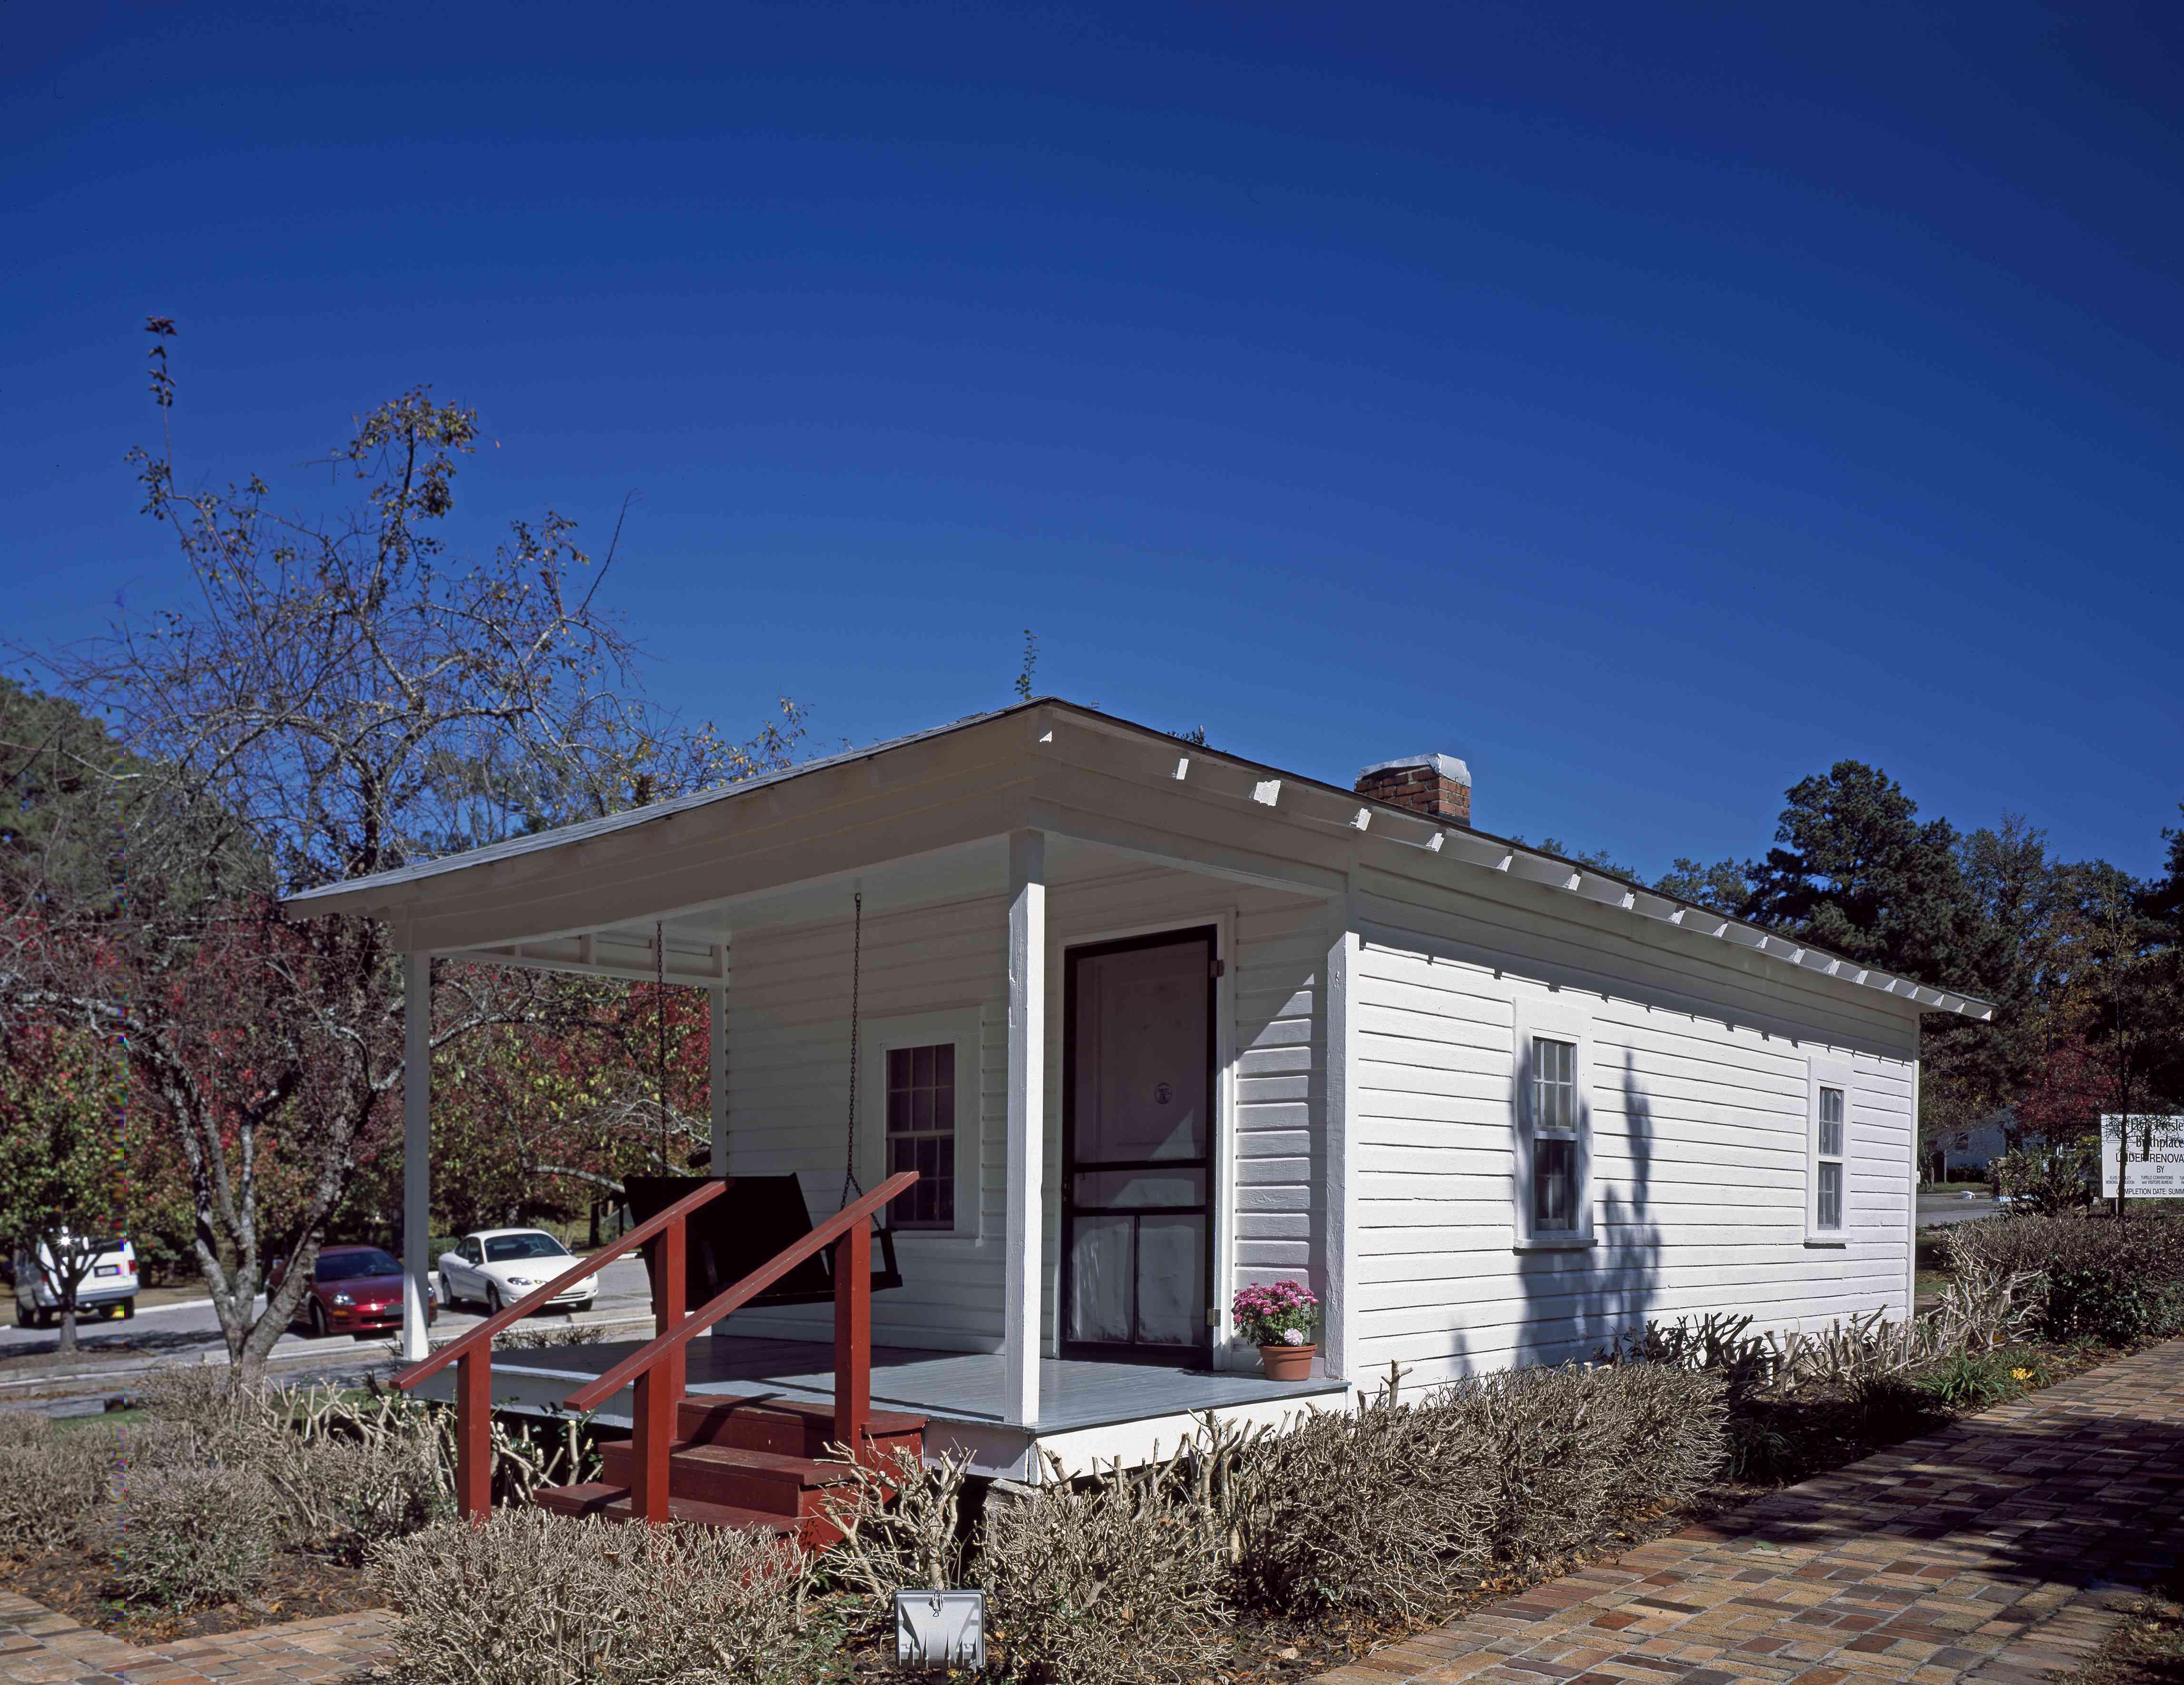 Elvis Presley birth home in Tupelo, Mississippi